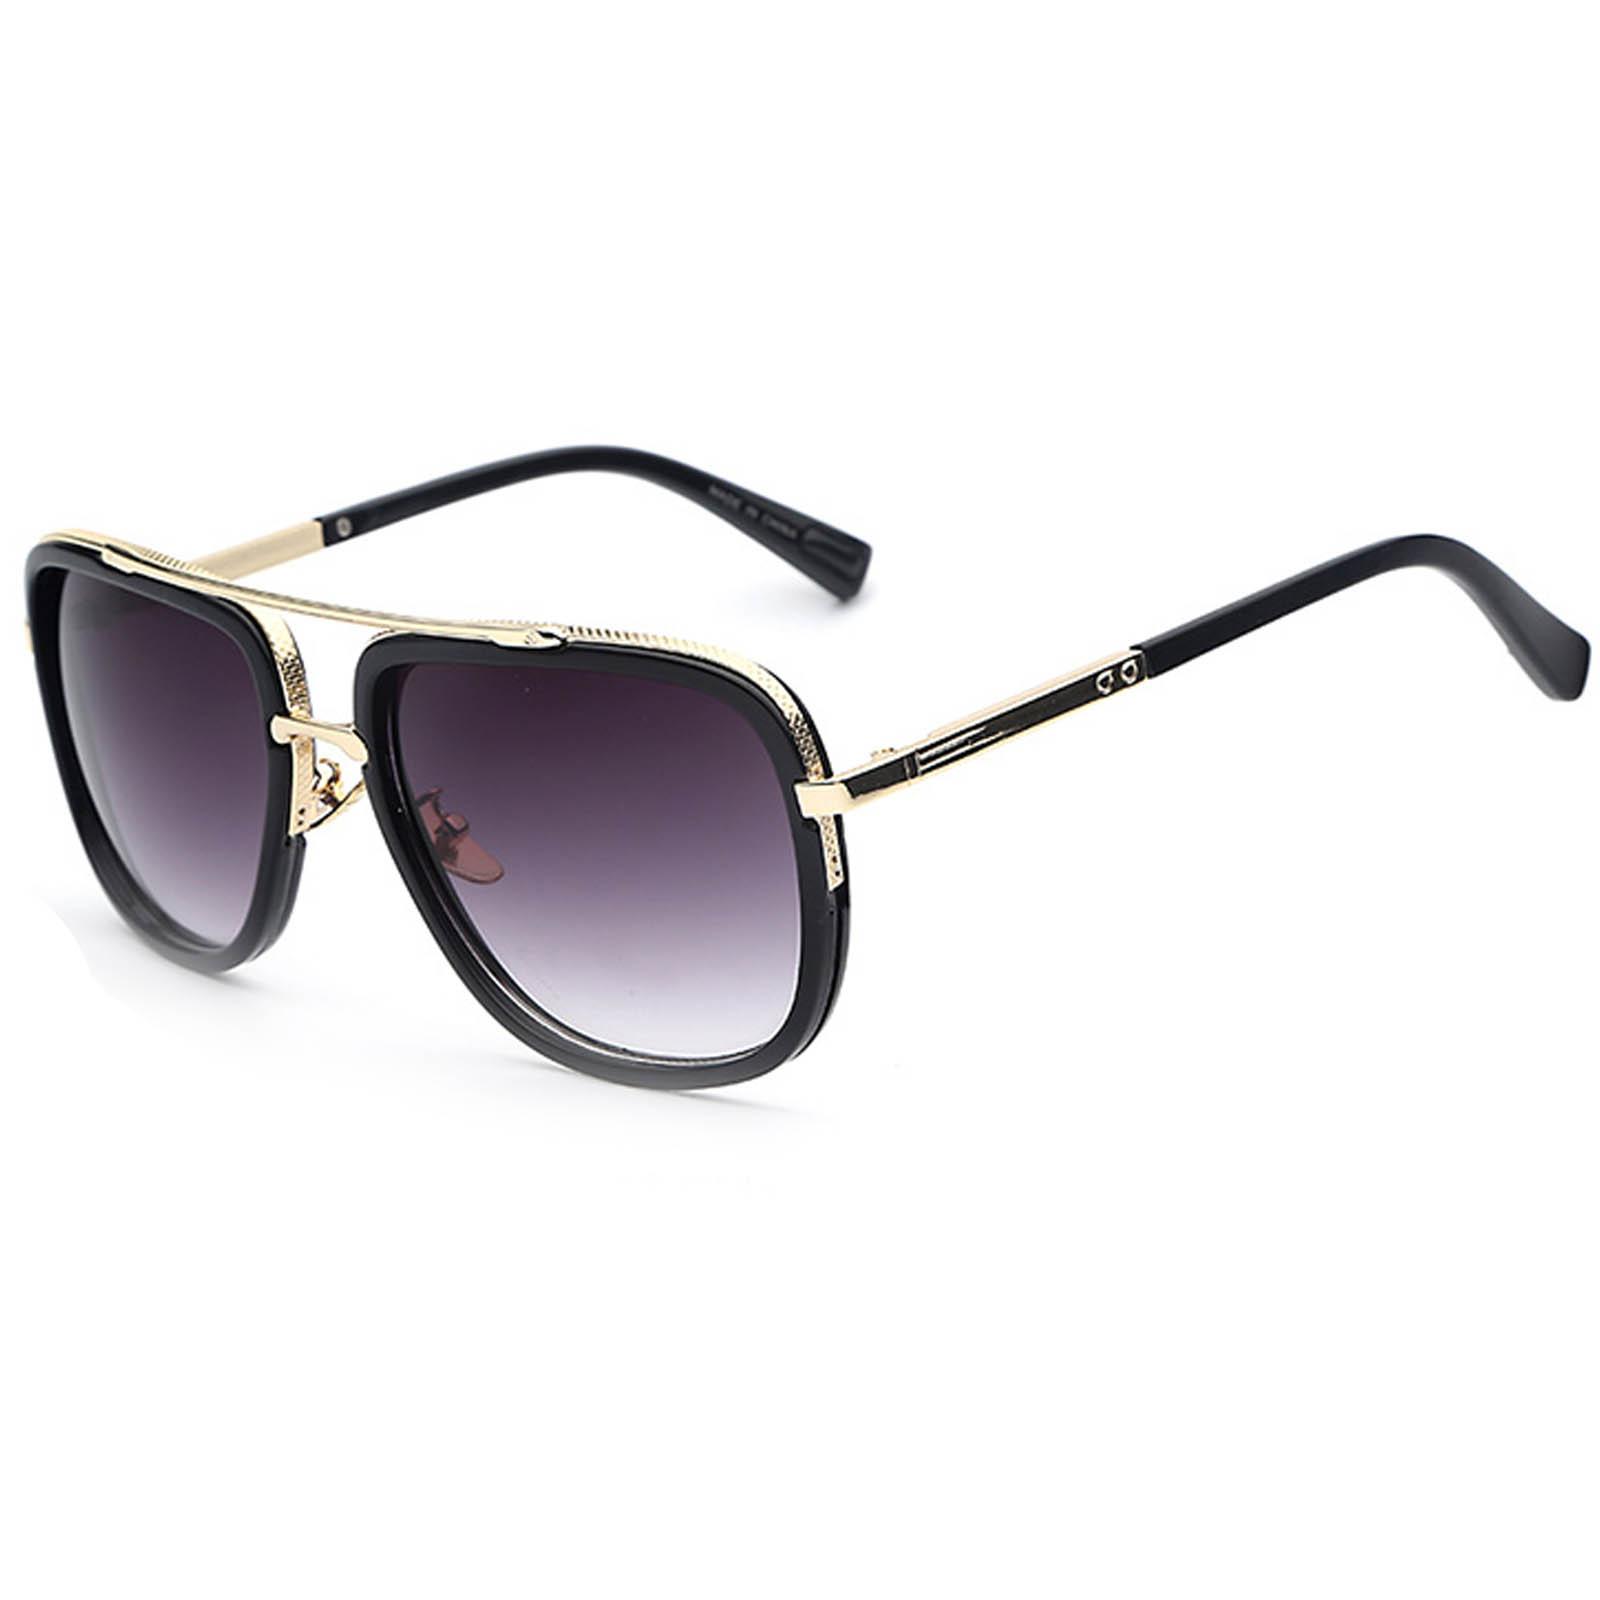 OWL ® 011 C1 Aviator Eyewear Sunglasses Women's Men's Metal Black Frame Smoke Lens One Pair